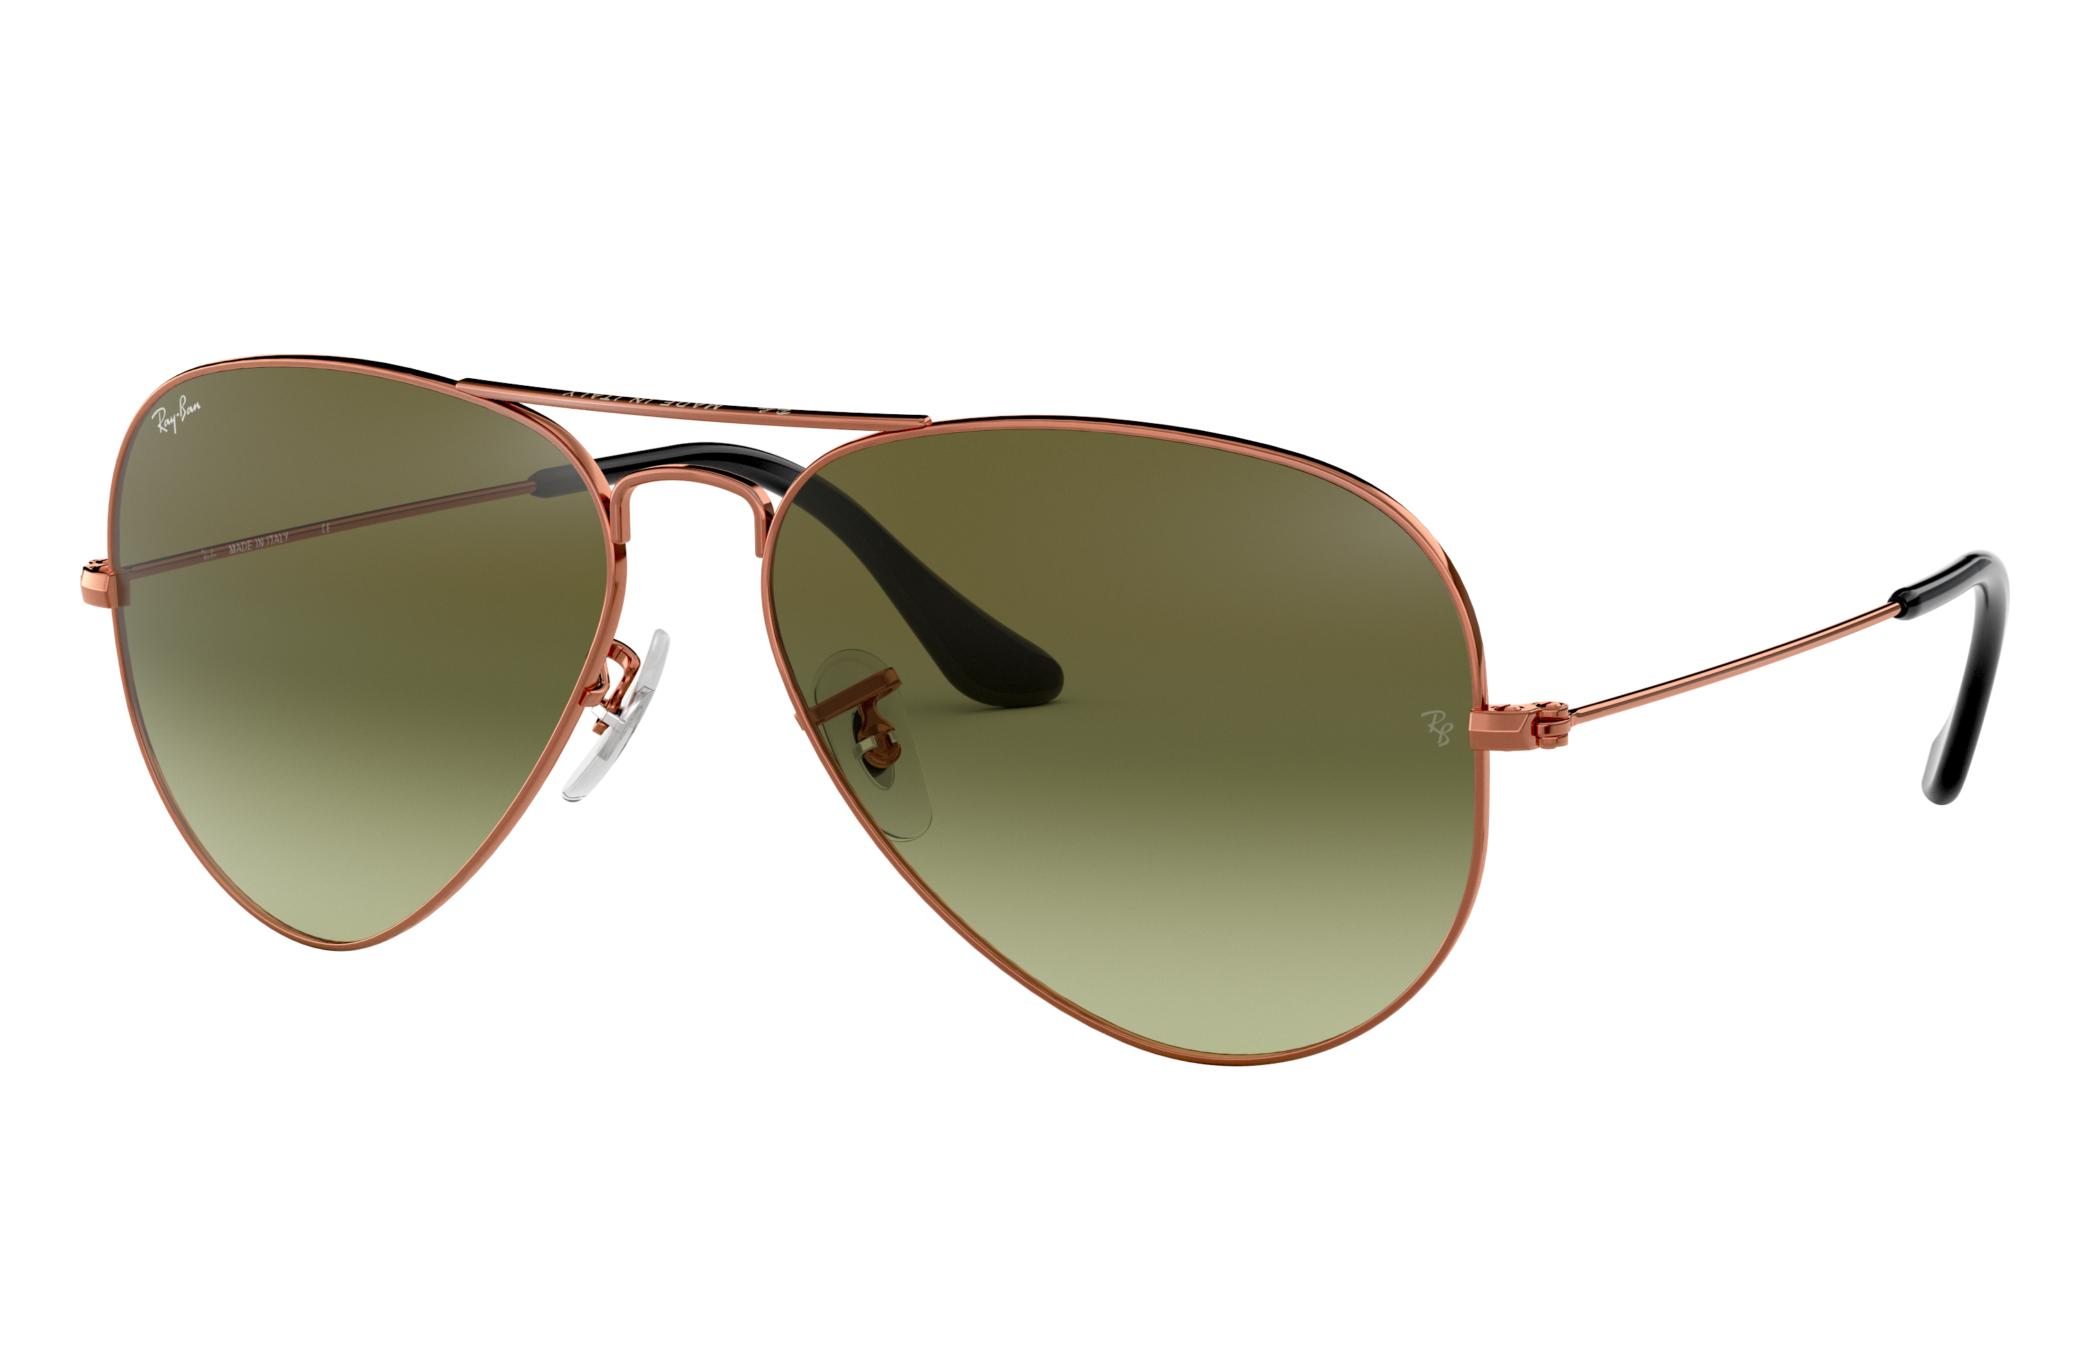 Ray-Ban Aviator Gradient Bronze-Copper, Green Lenses - RB3025